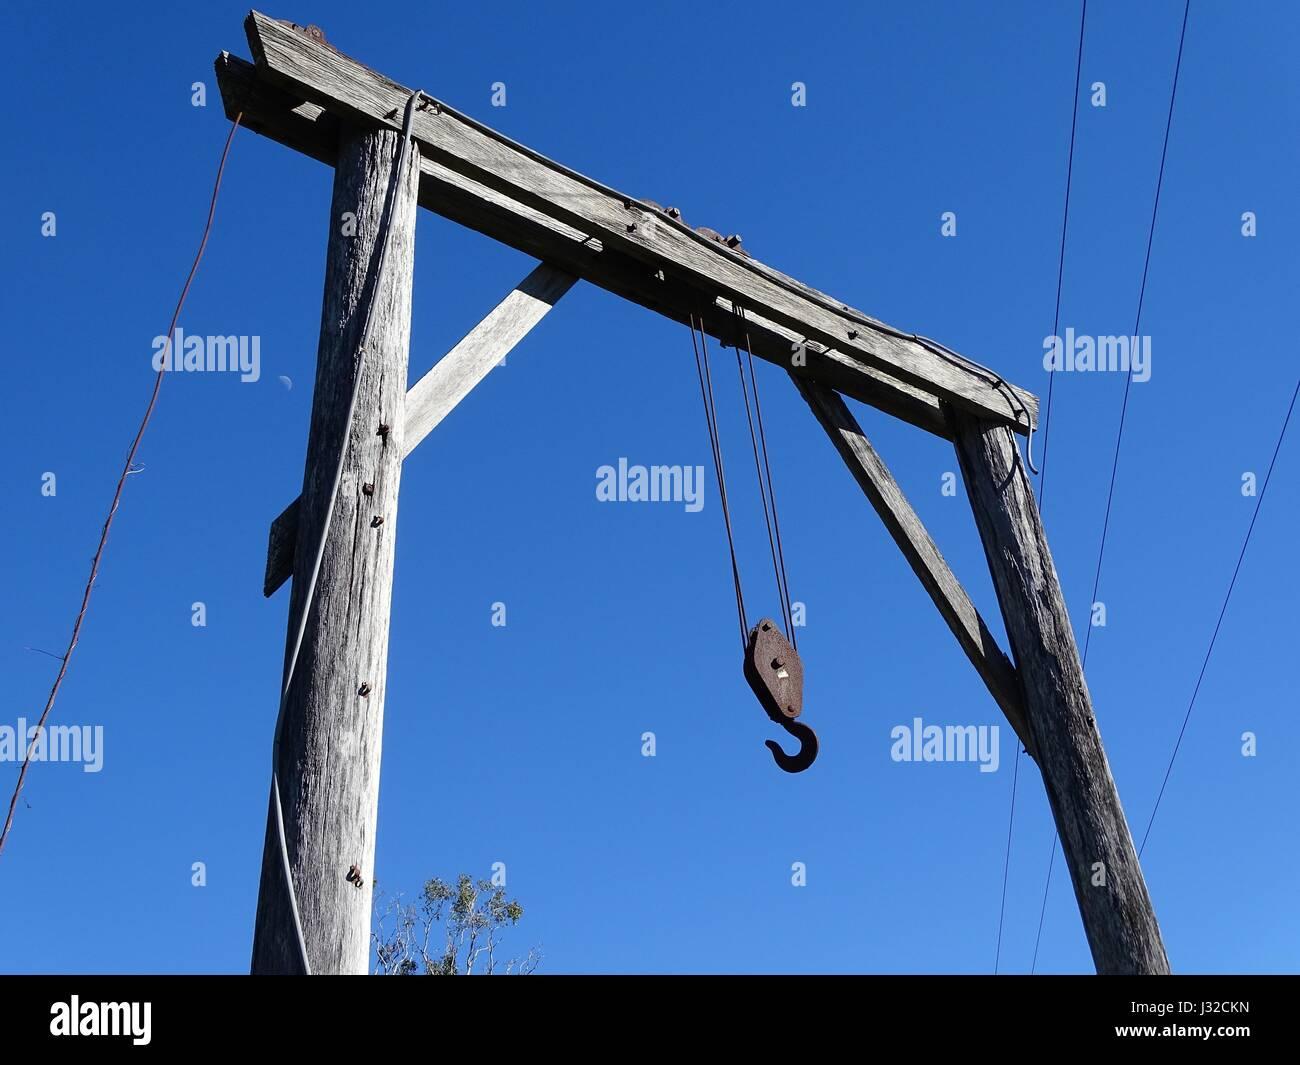 A Crane Gantry Stock Photo 139580777 Alamy